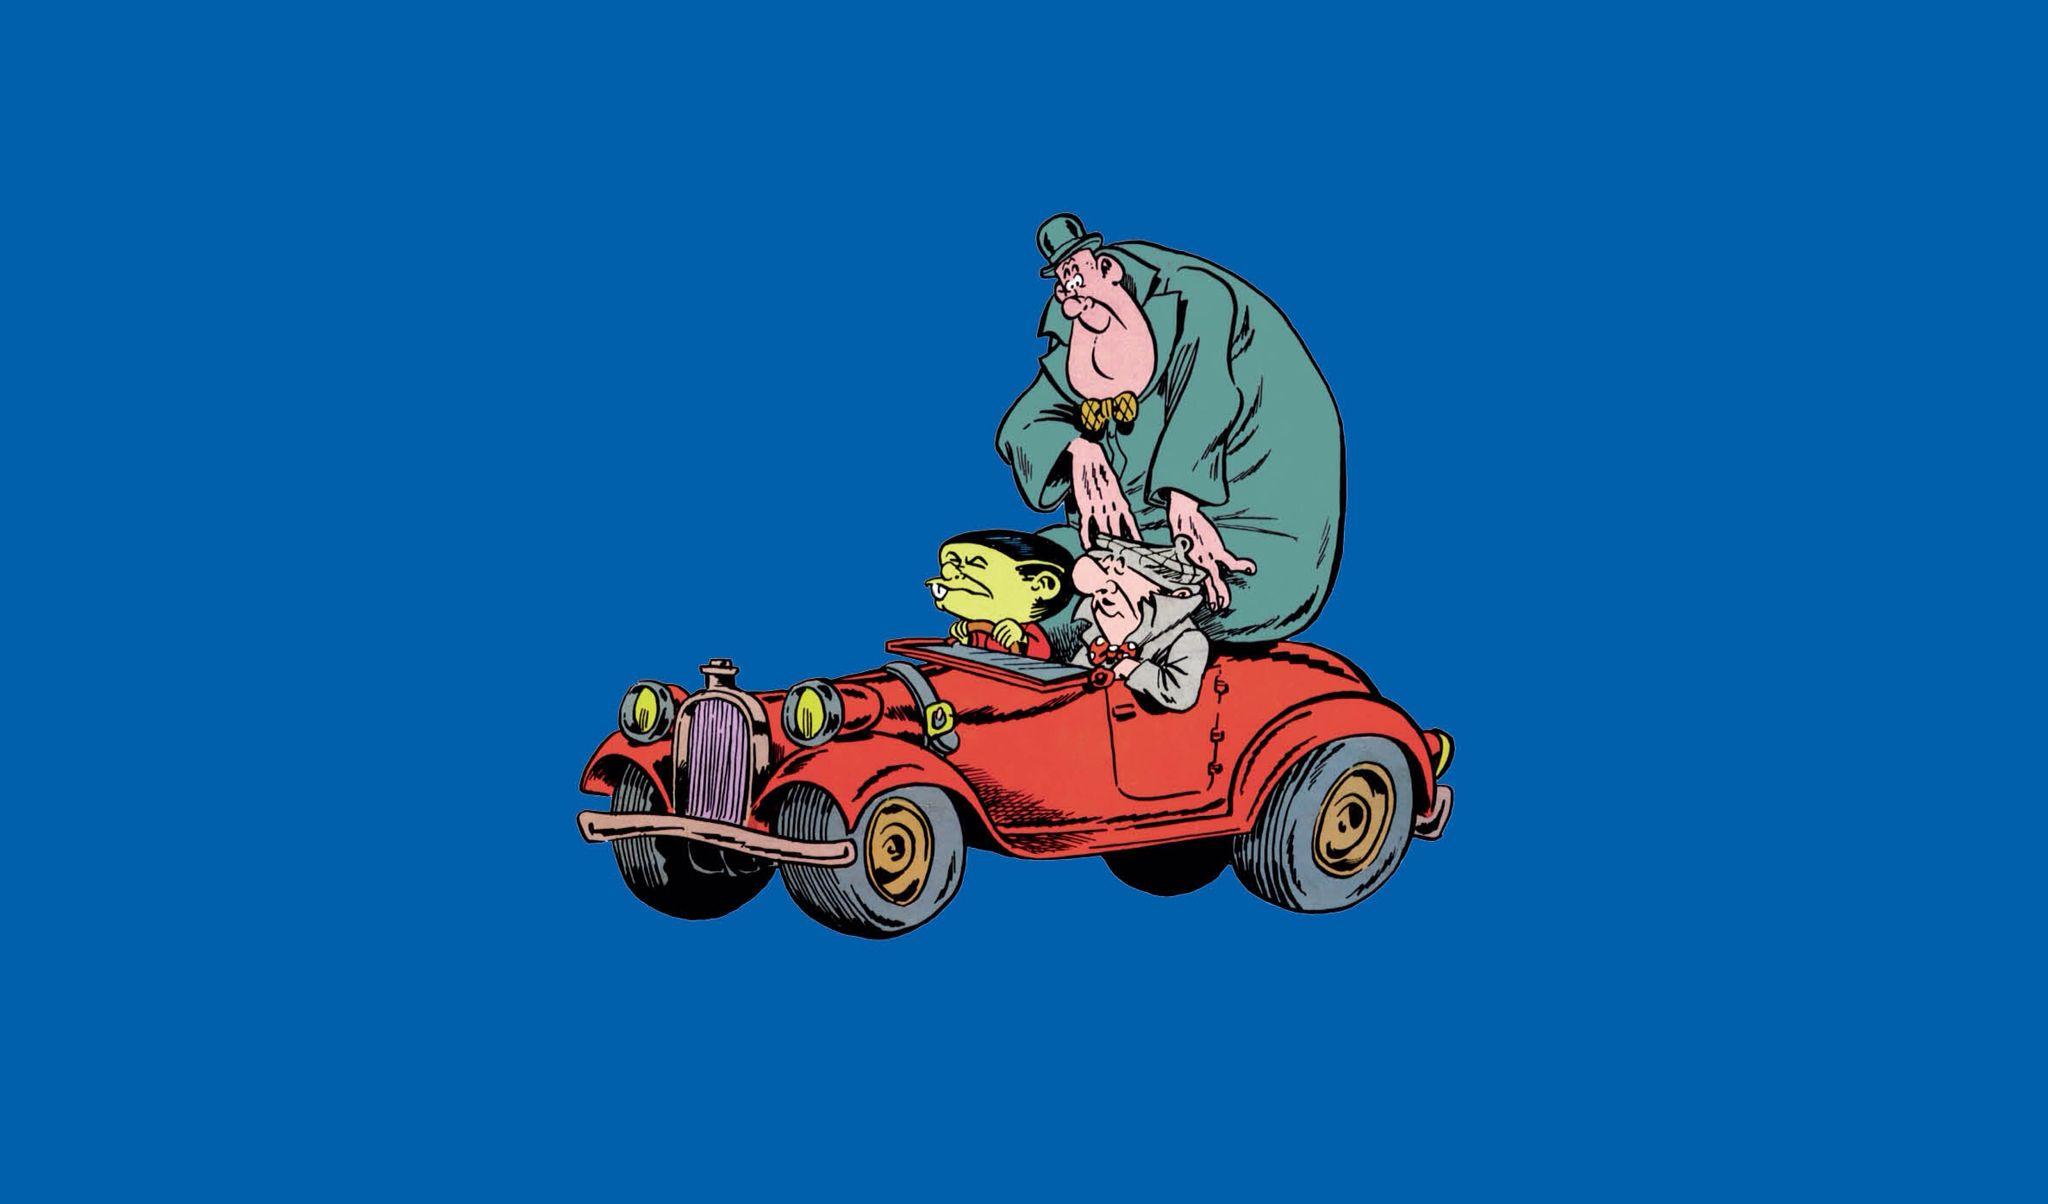 Alan ford gruppo t n t ubc enciclopedia online del fumetto - Ten And Patsy Nick Carter Helpers C Bonvi Eredi Bonvicini De Maria Guido De Maria Pinterest Nick Carter